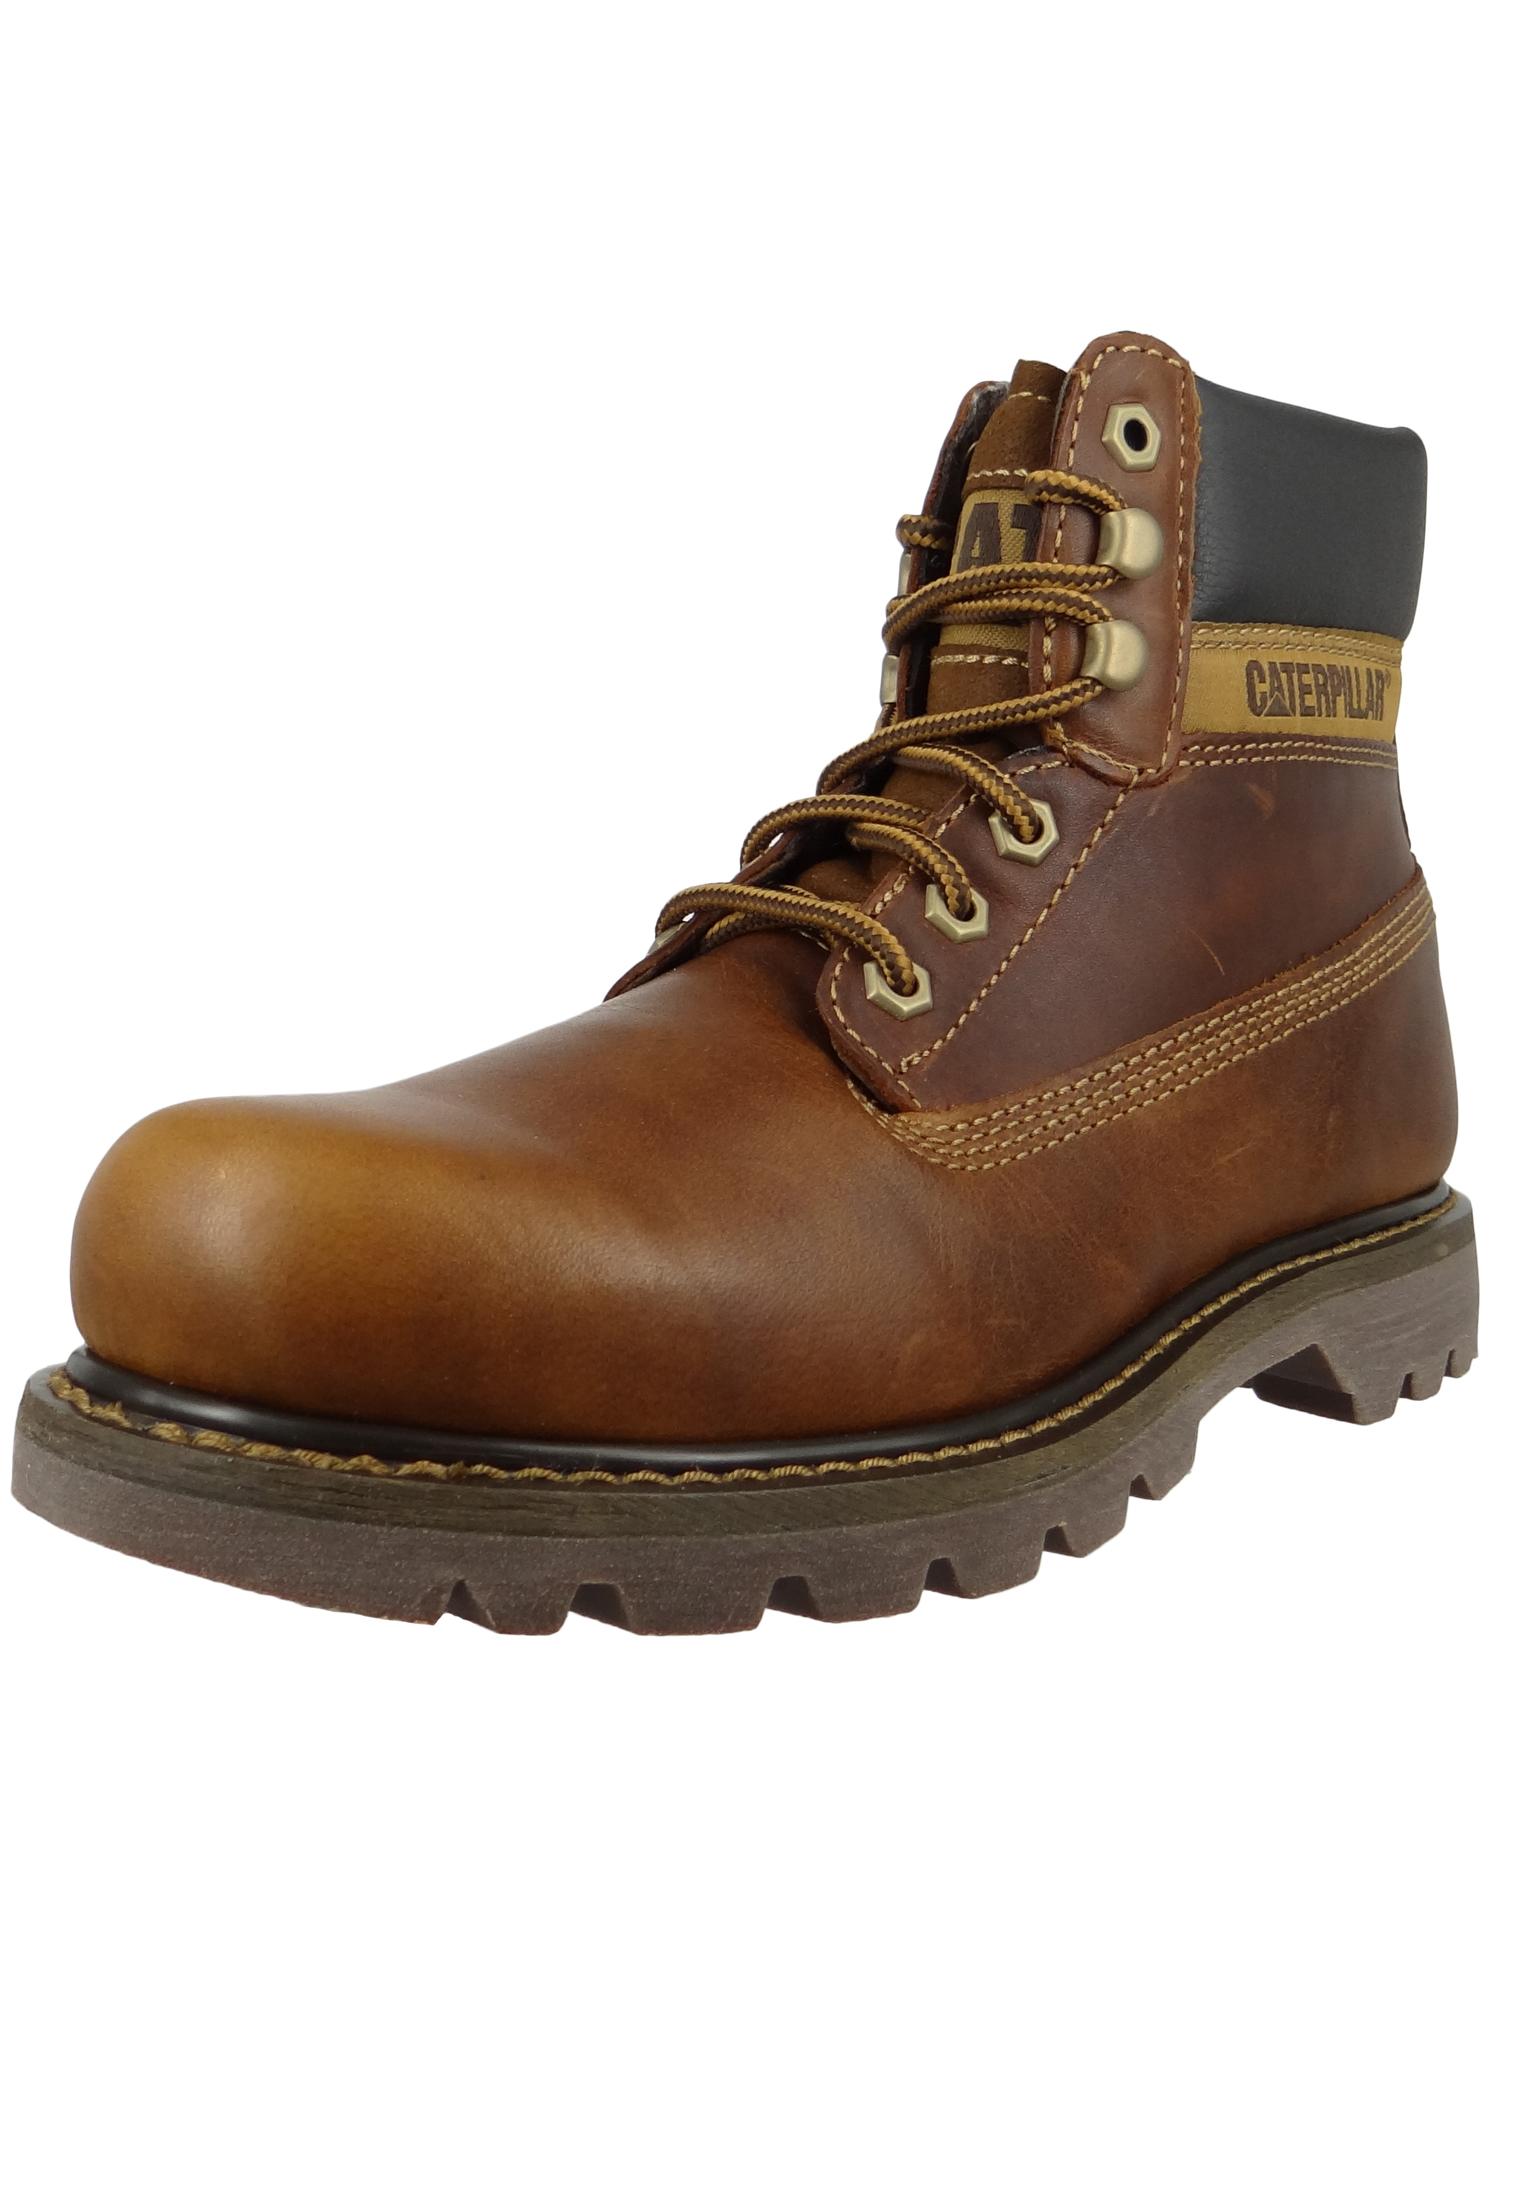 Colorado Braun P720263 Caterpillar Schuhe Stiefel Golden Cat Leder EQxBeWrdCo